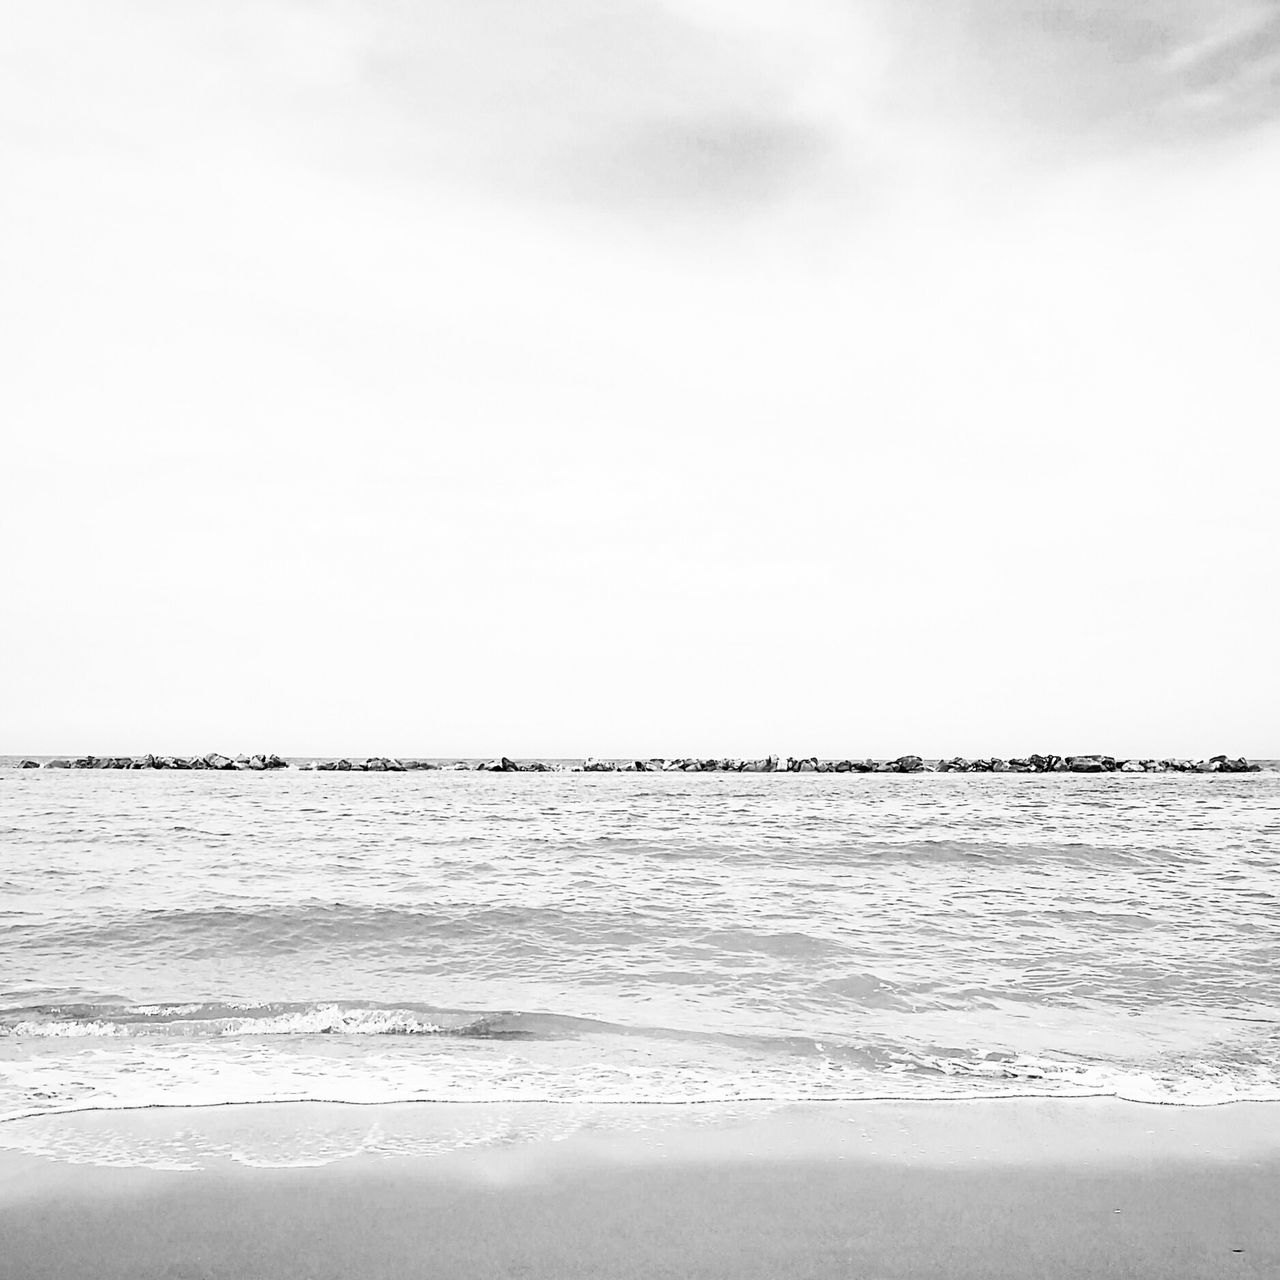 Blackandwhite Photography Monochrome _ Collection Monochrome B&W Collective Sea Gray Heaven Black & White